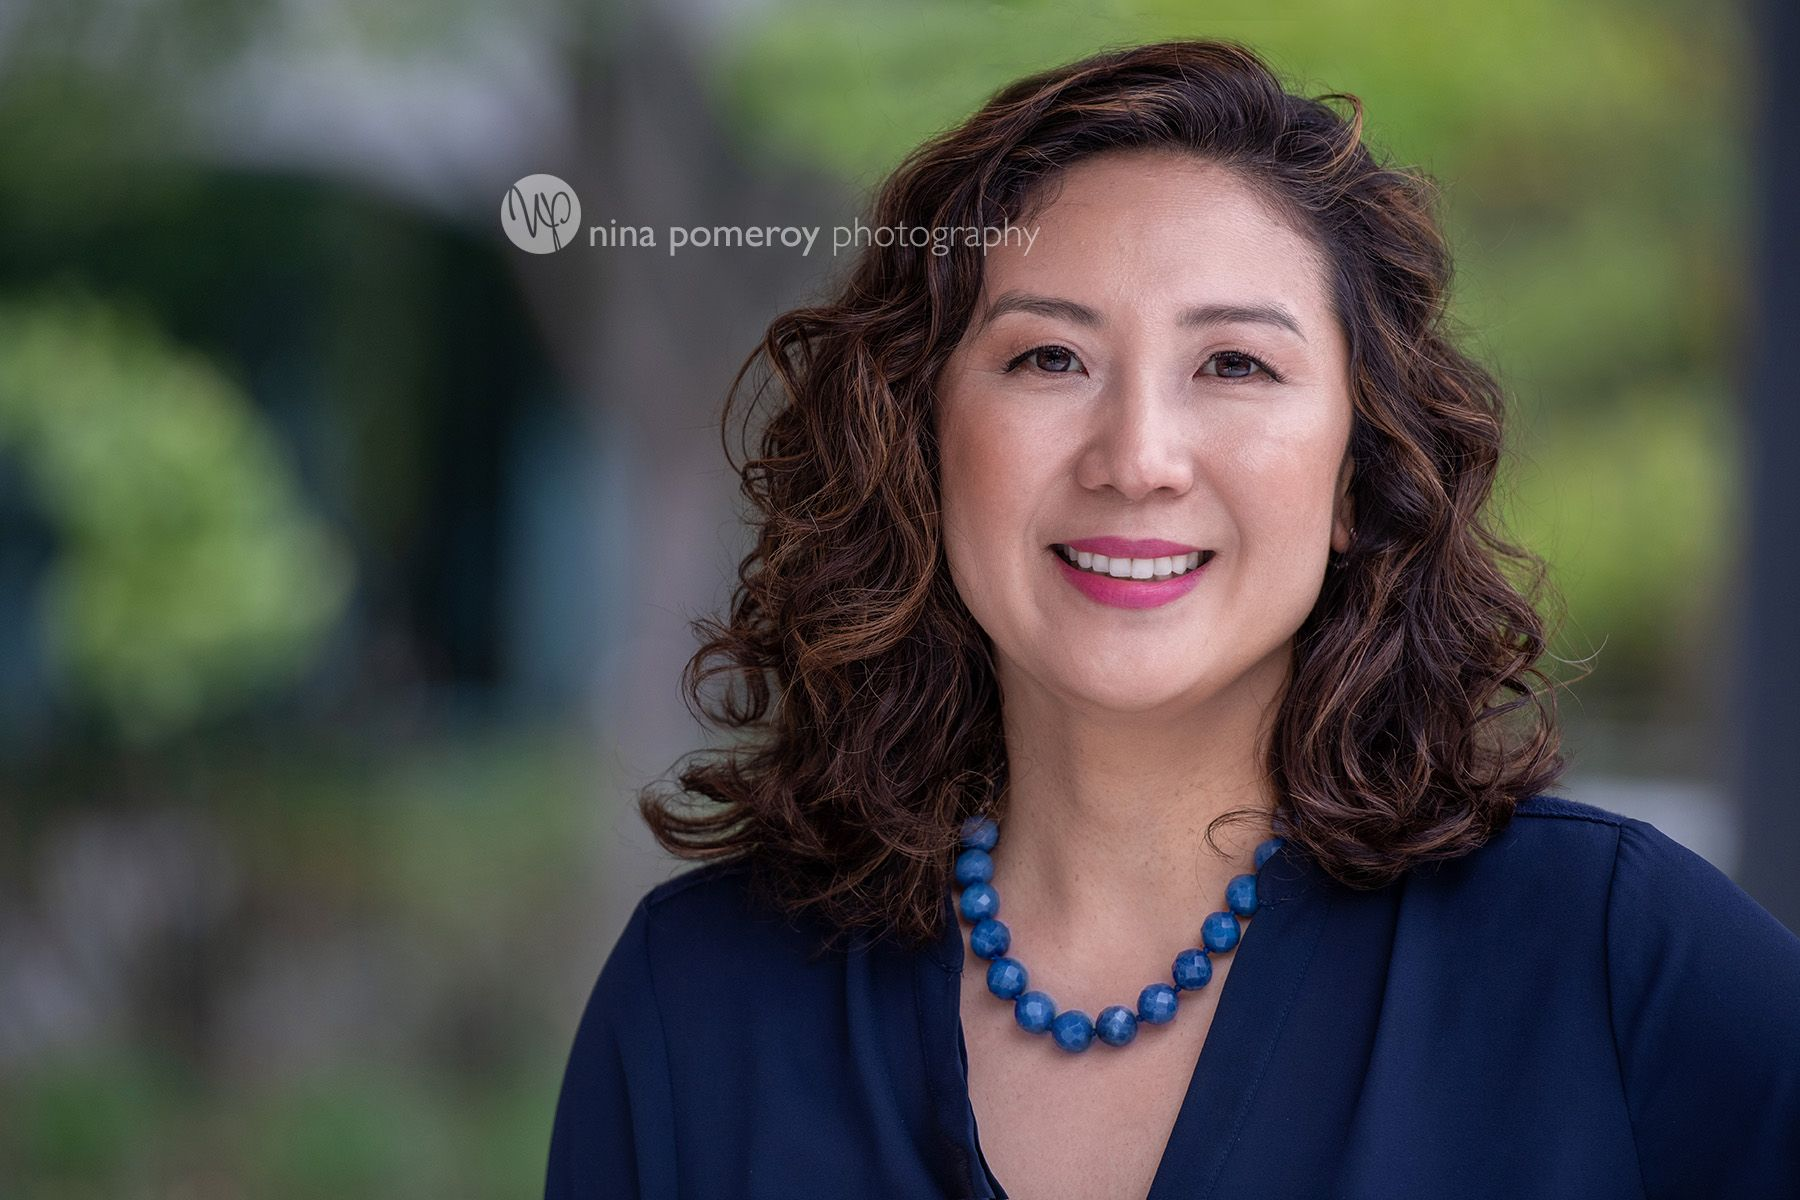 Women in Business Headshot Headshot photography